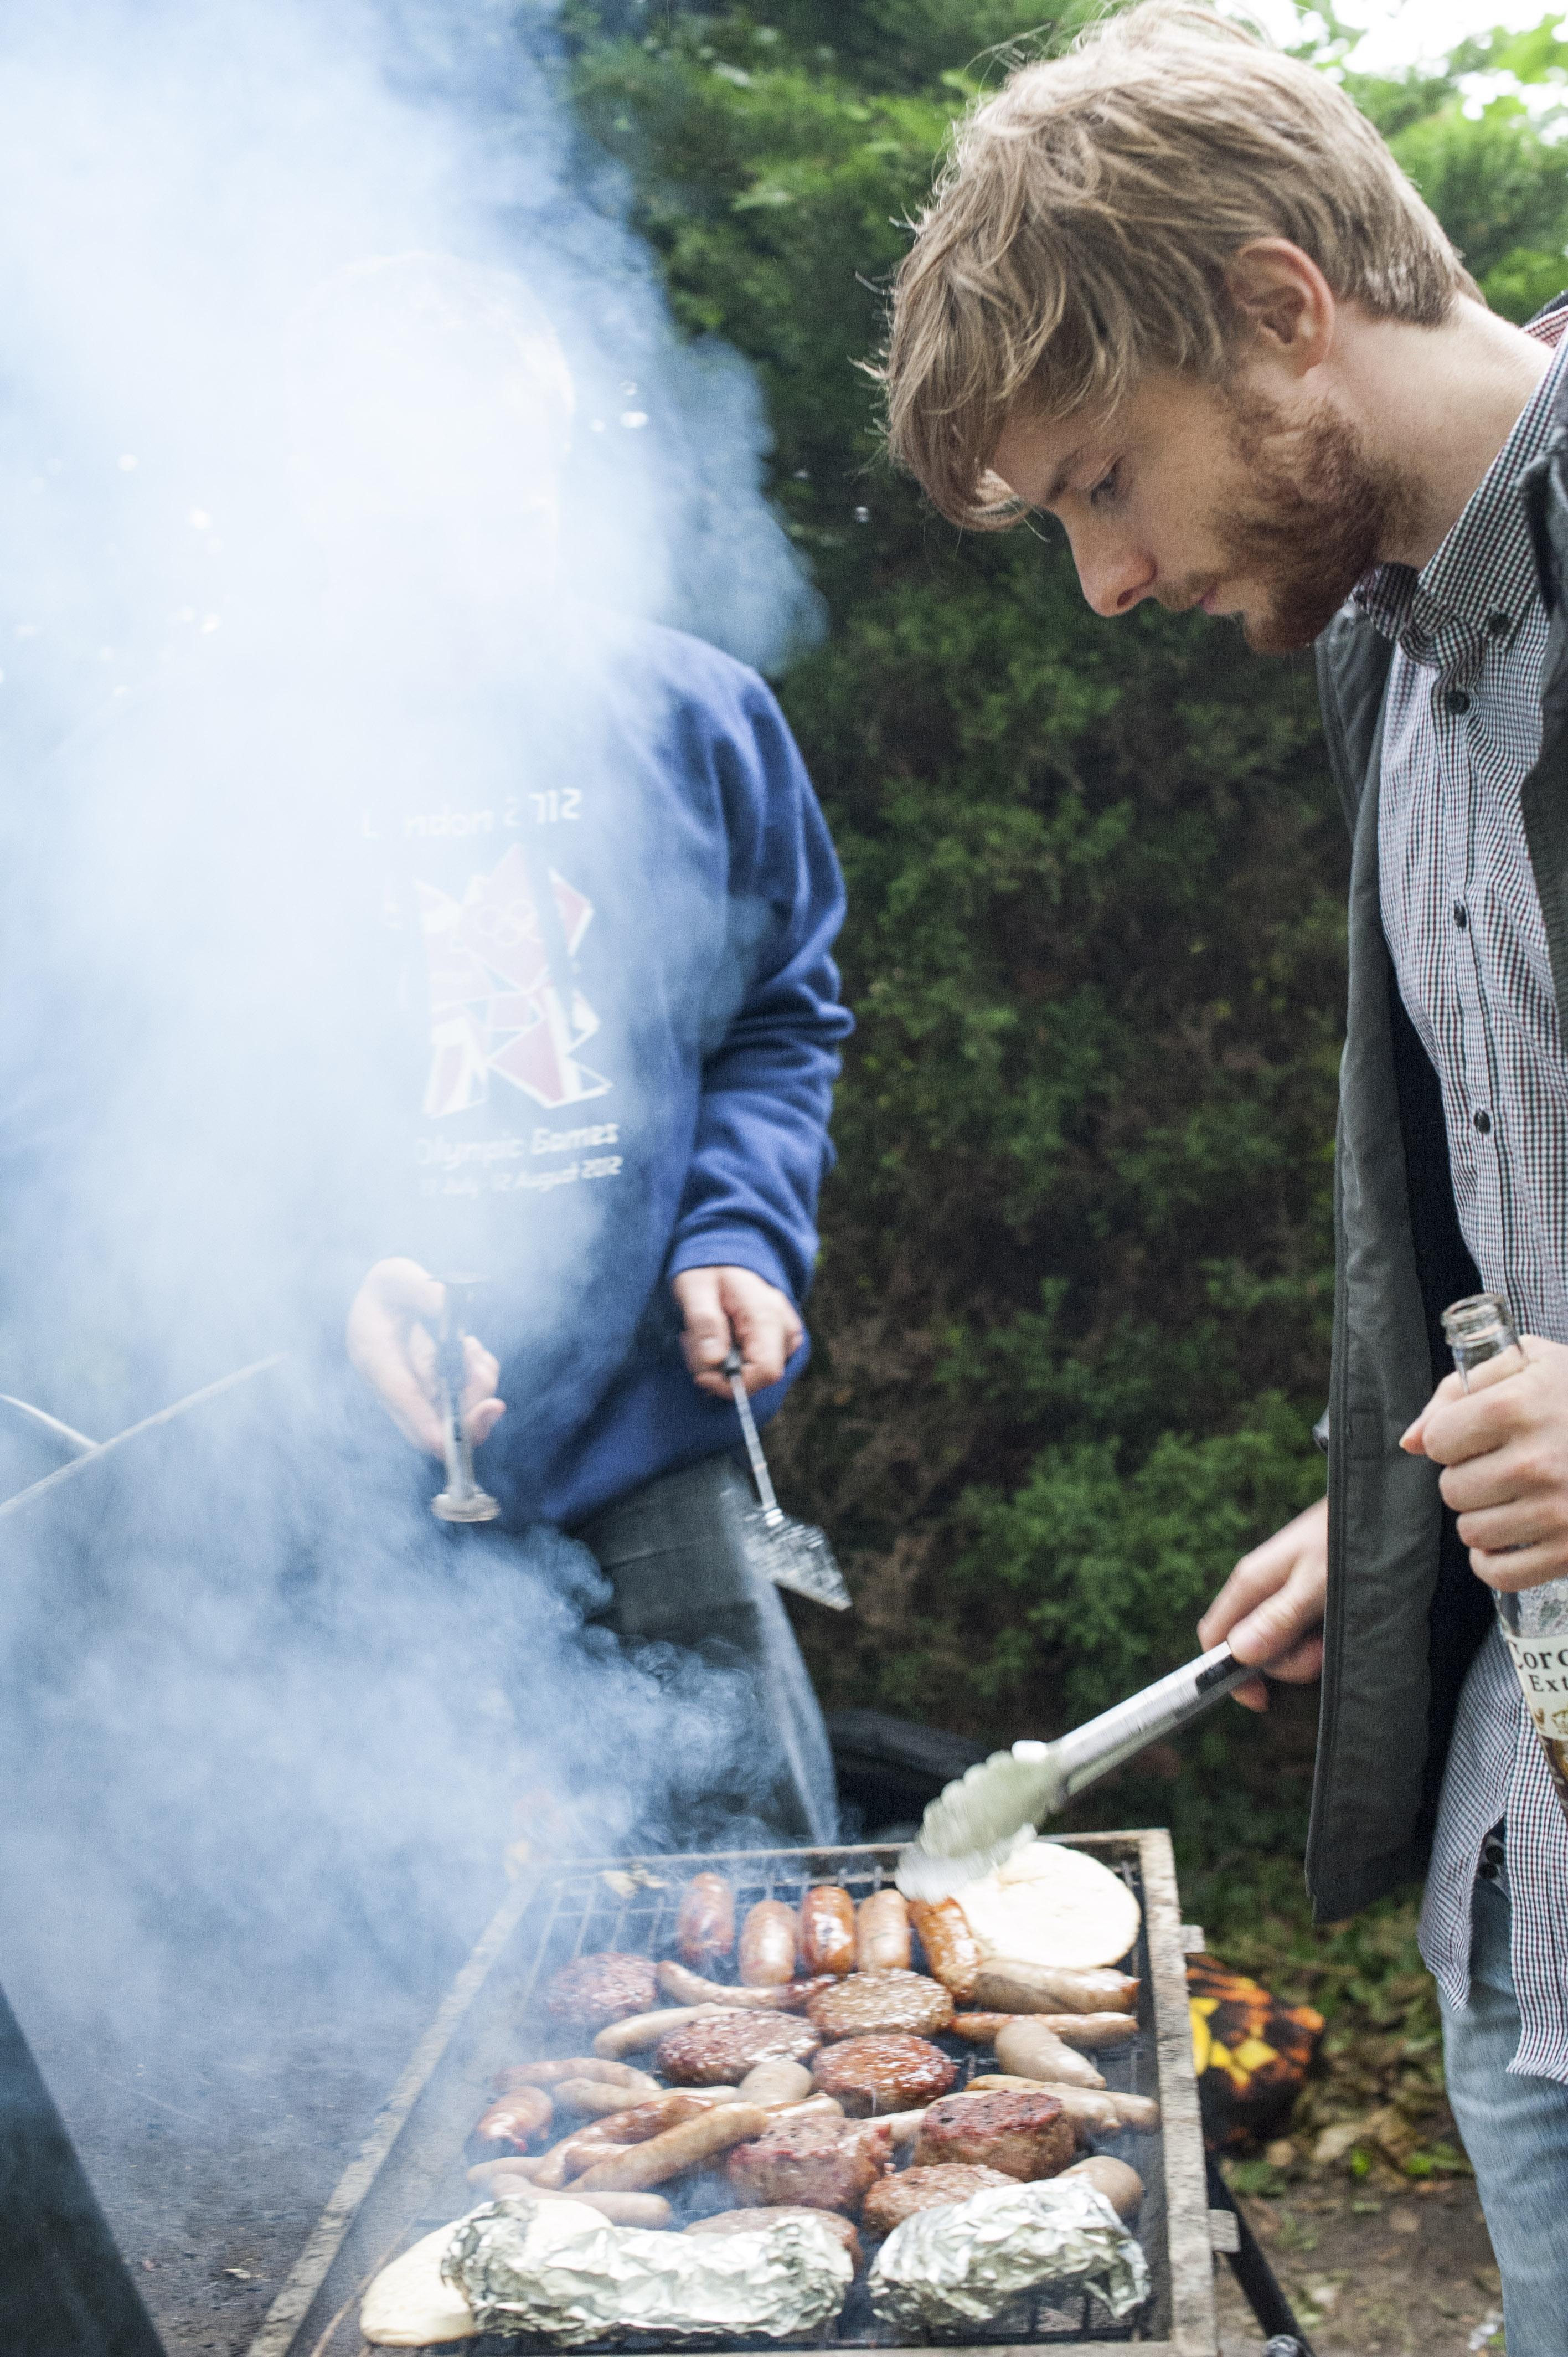 Smoky barbecue